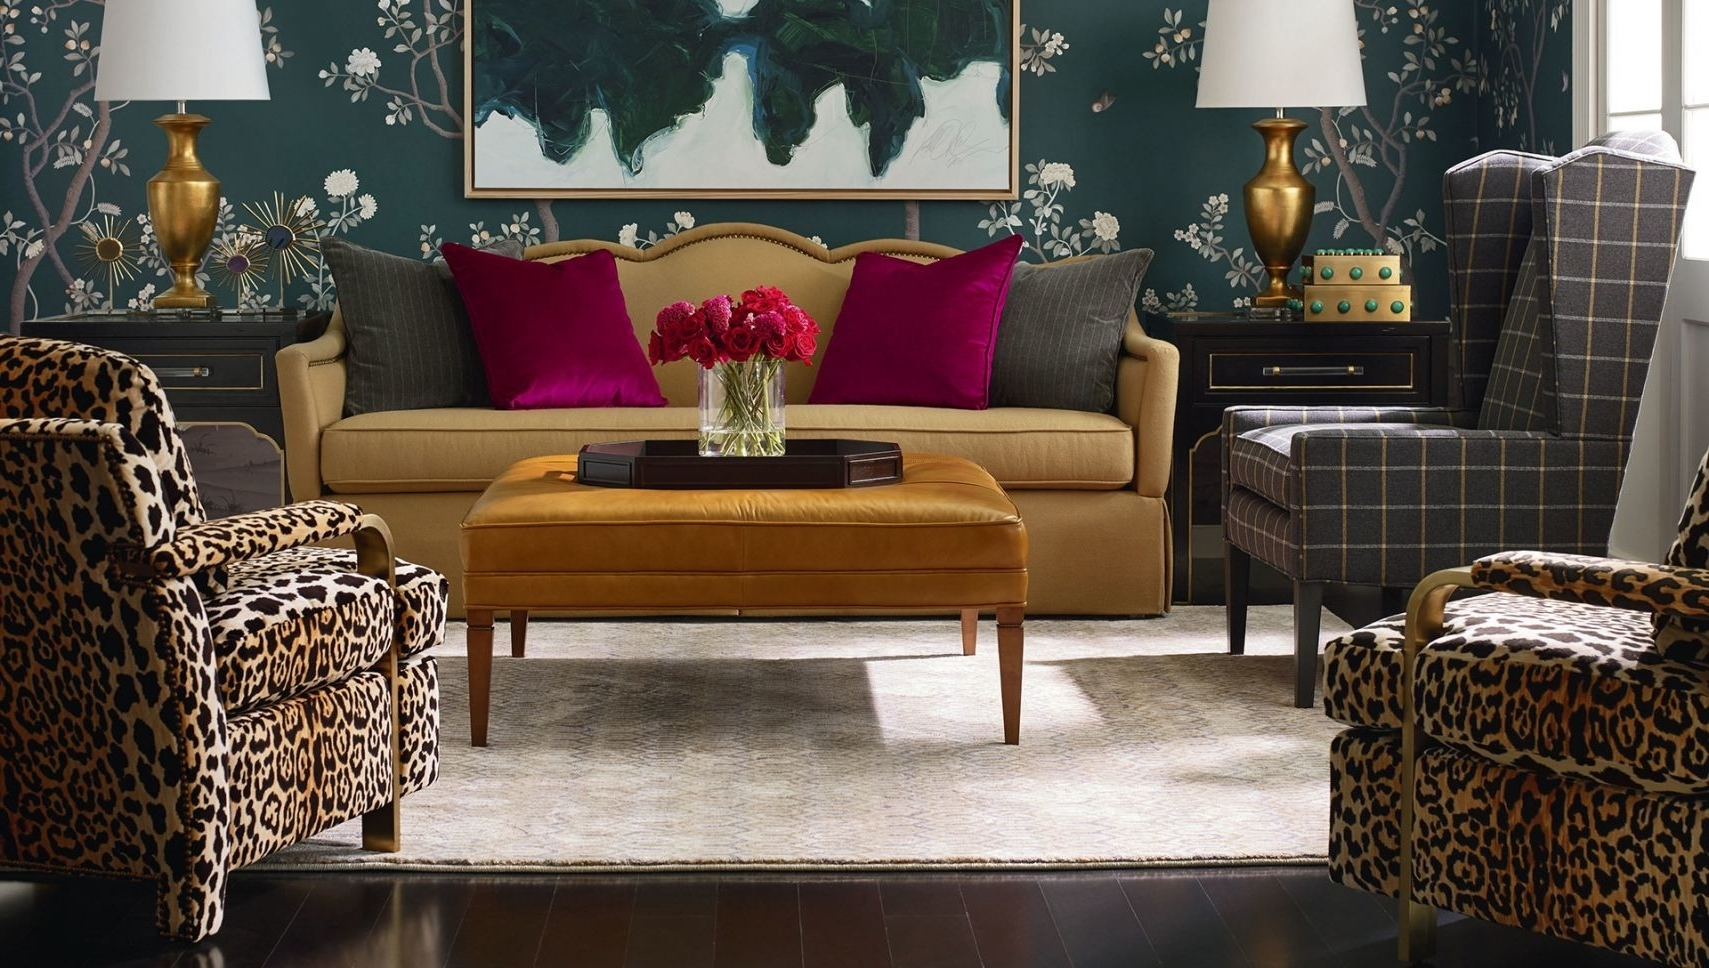 Preferred Powells Furniture Richmond Va Rooms To Go Midlothian Va Sofa Within Virginia Beach Sectional Sofas (View 18 of 20)